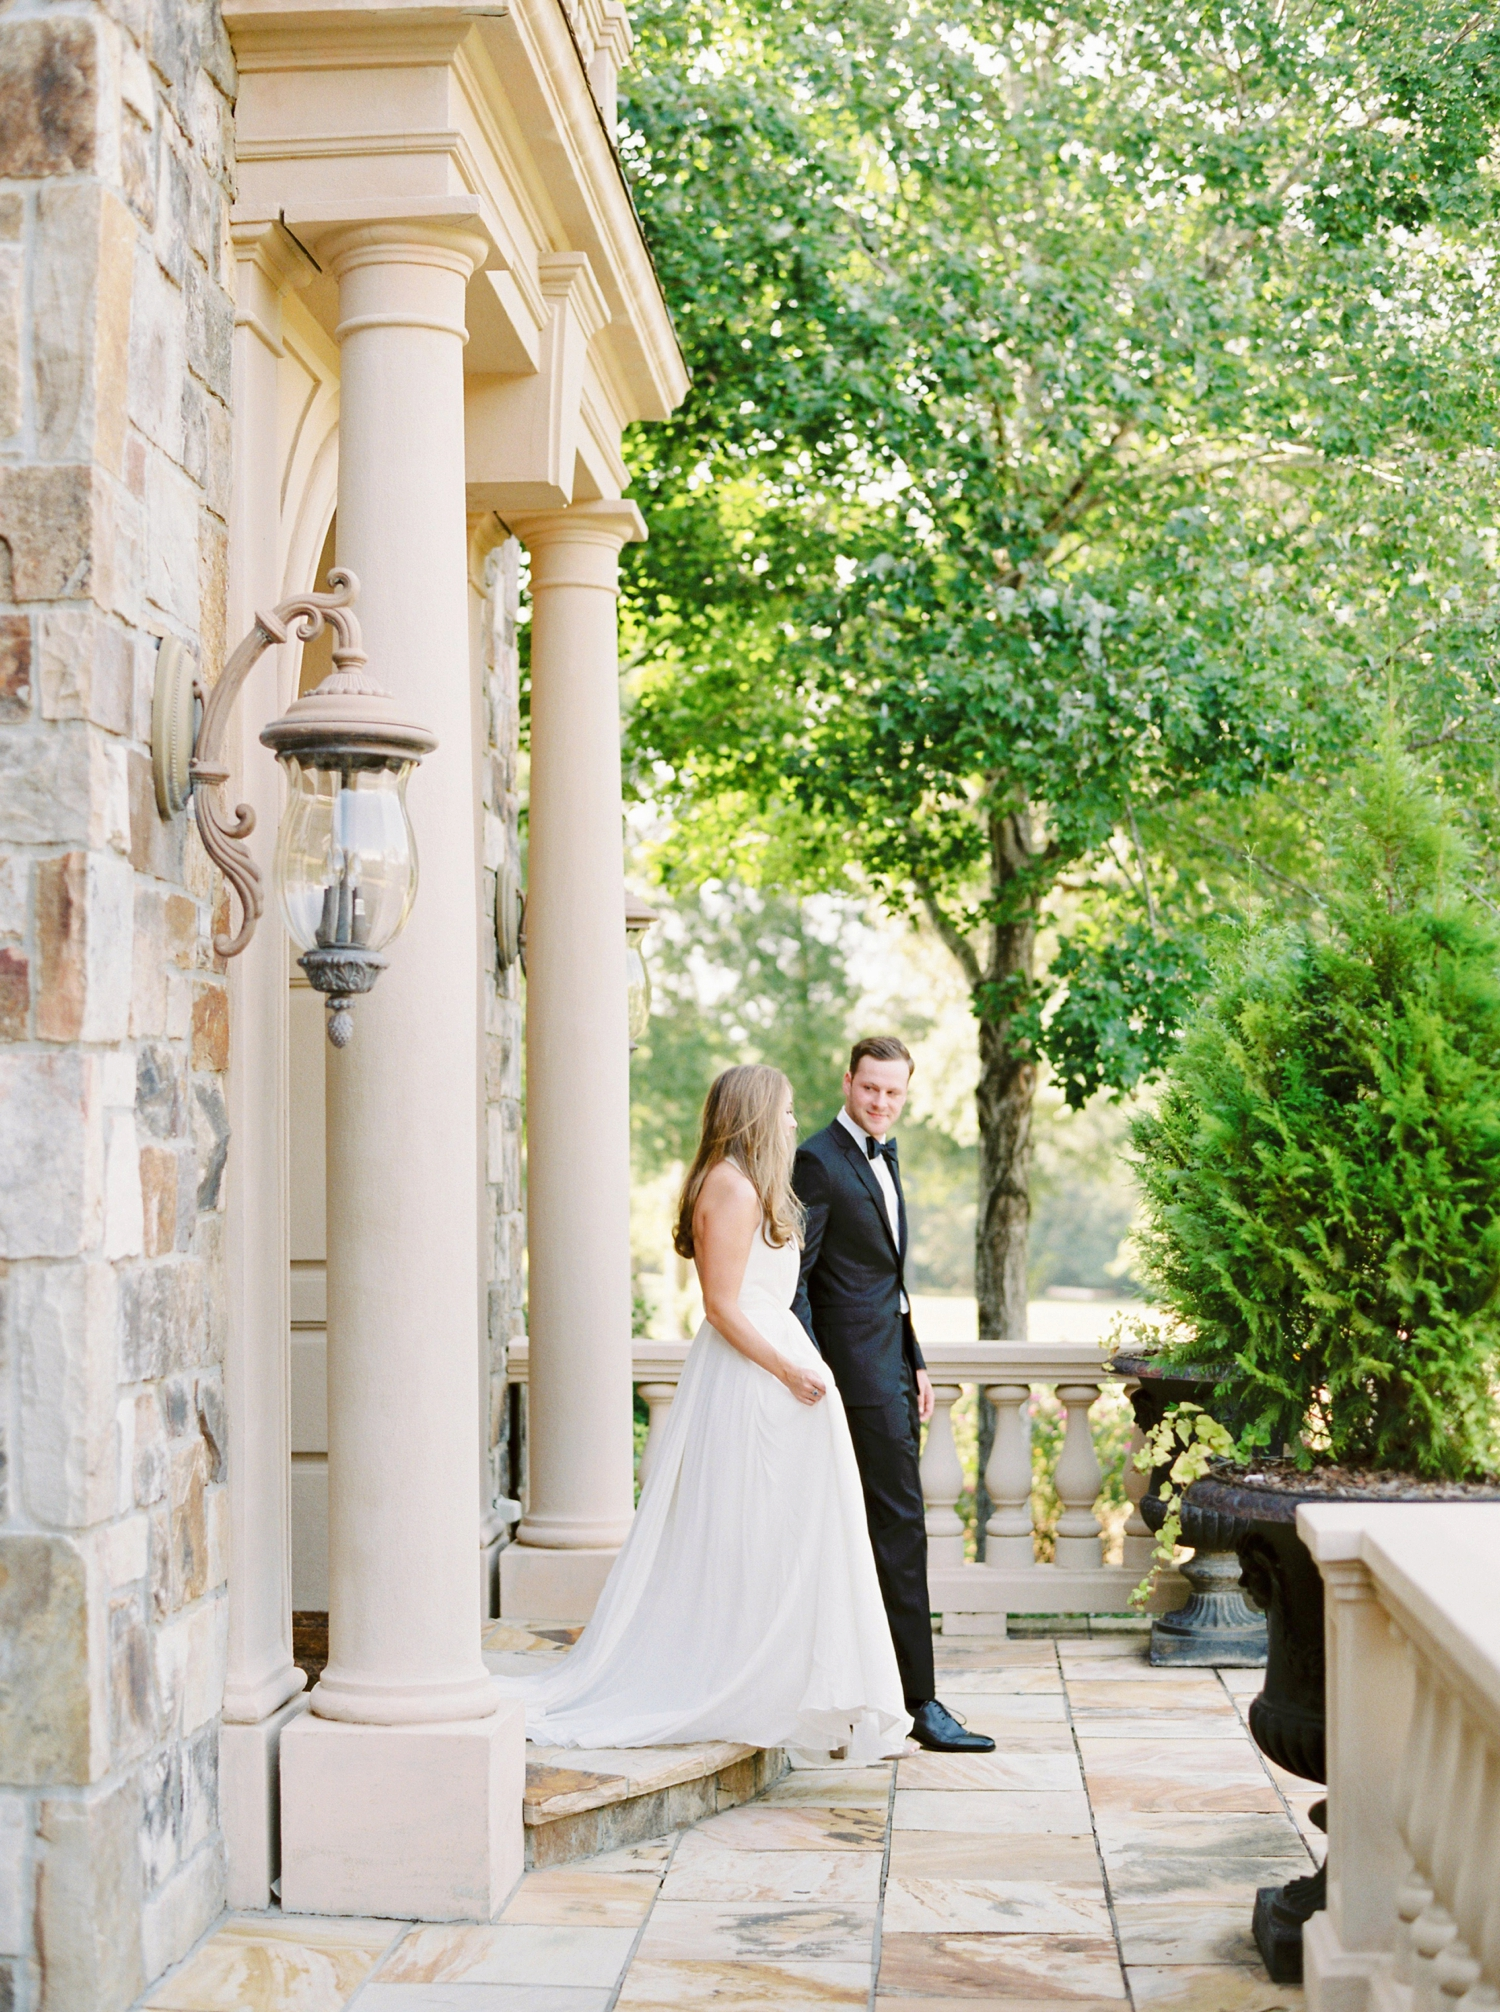 Calgary wedding photographers | georgia wedding photographers | fine art film | Justine Milton Photography | wedding details | georgia wedding | bride and groom portraits